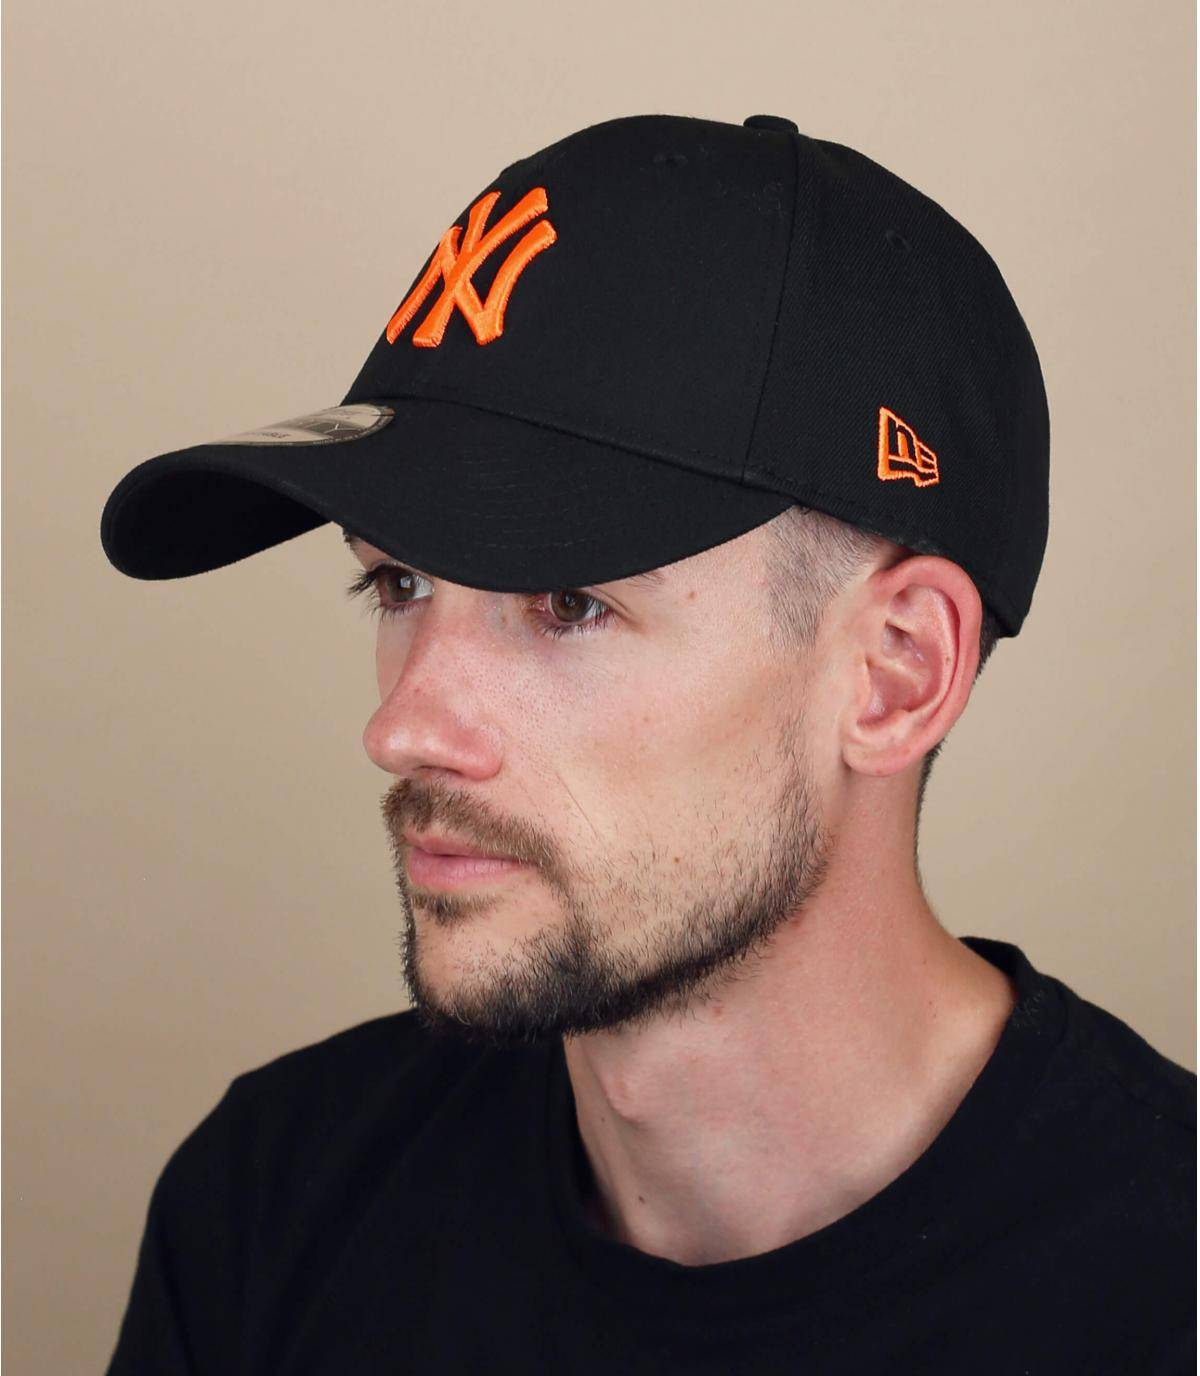 casquette NY noir orange